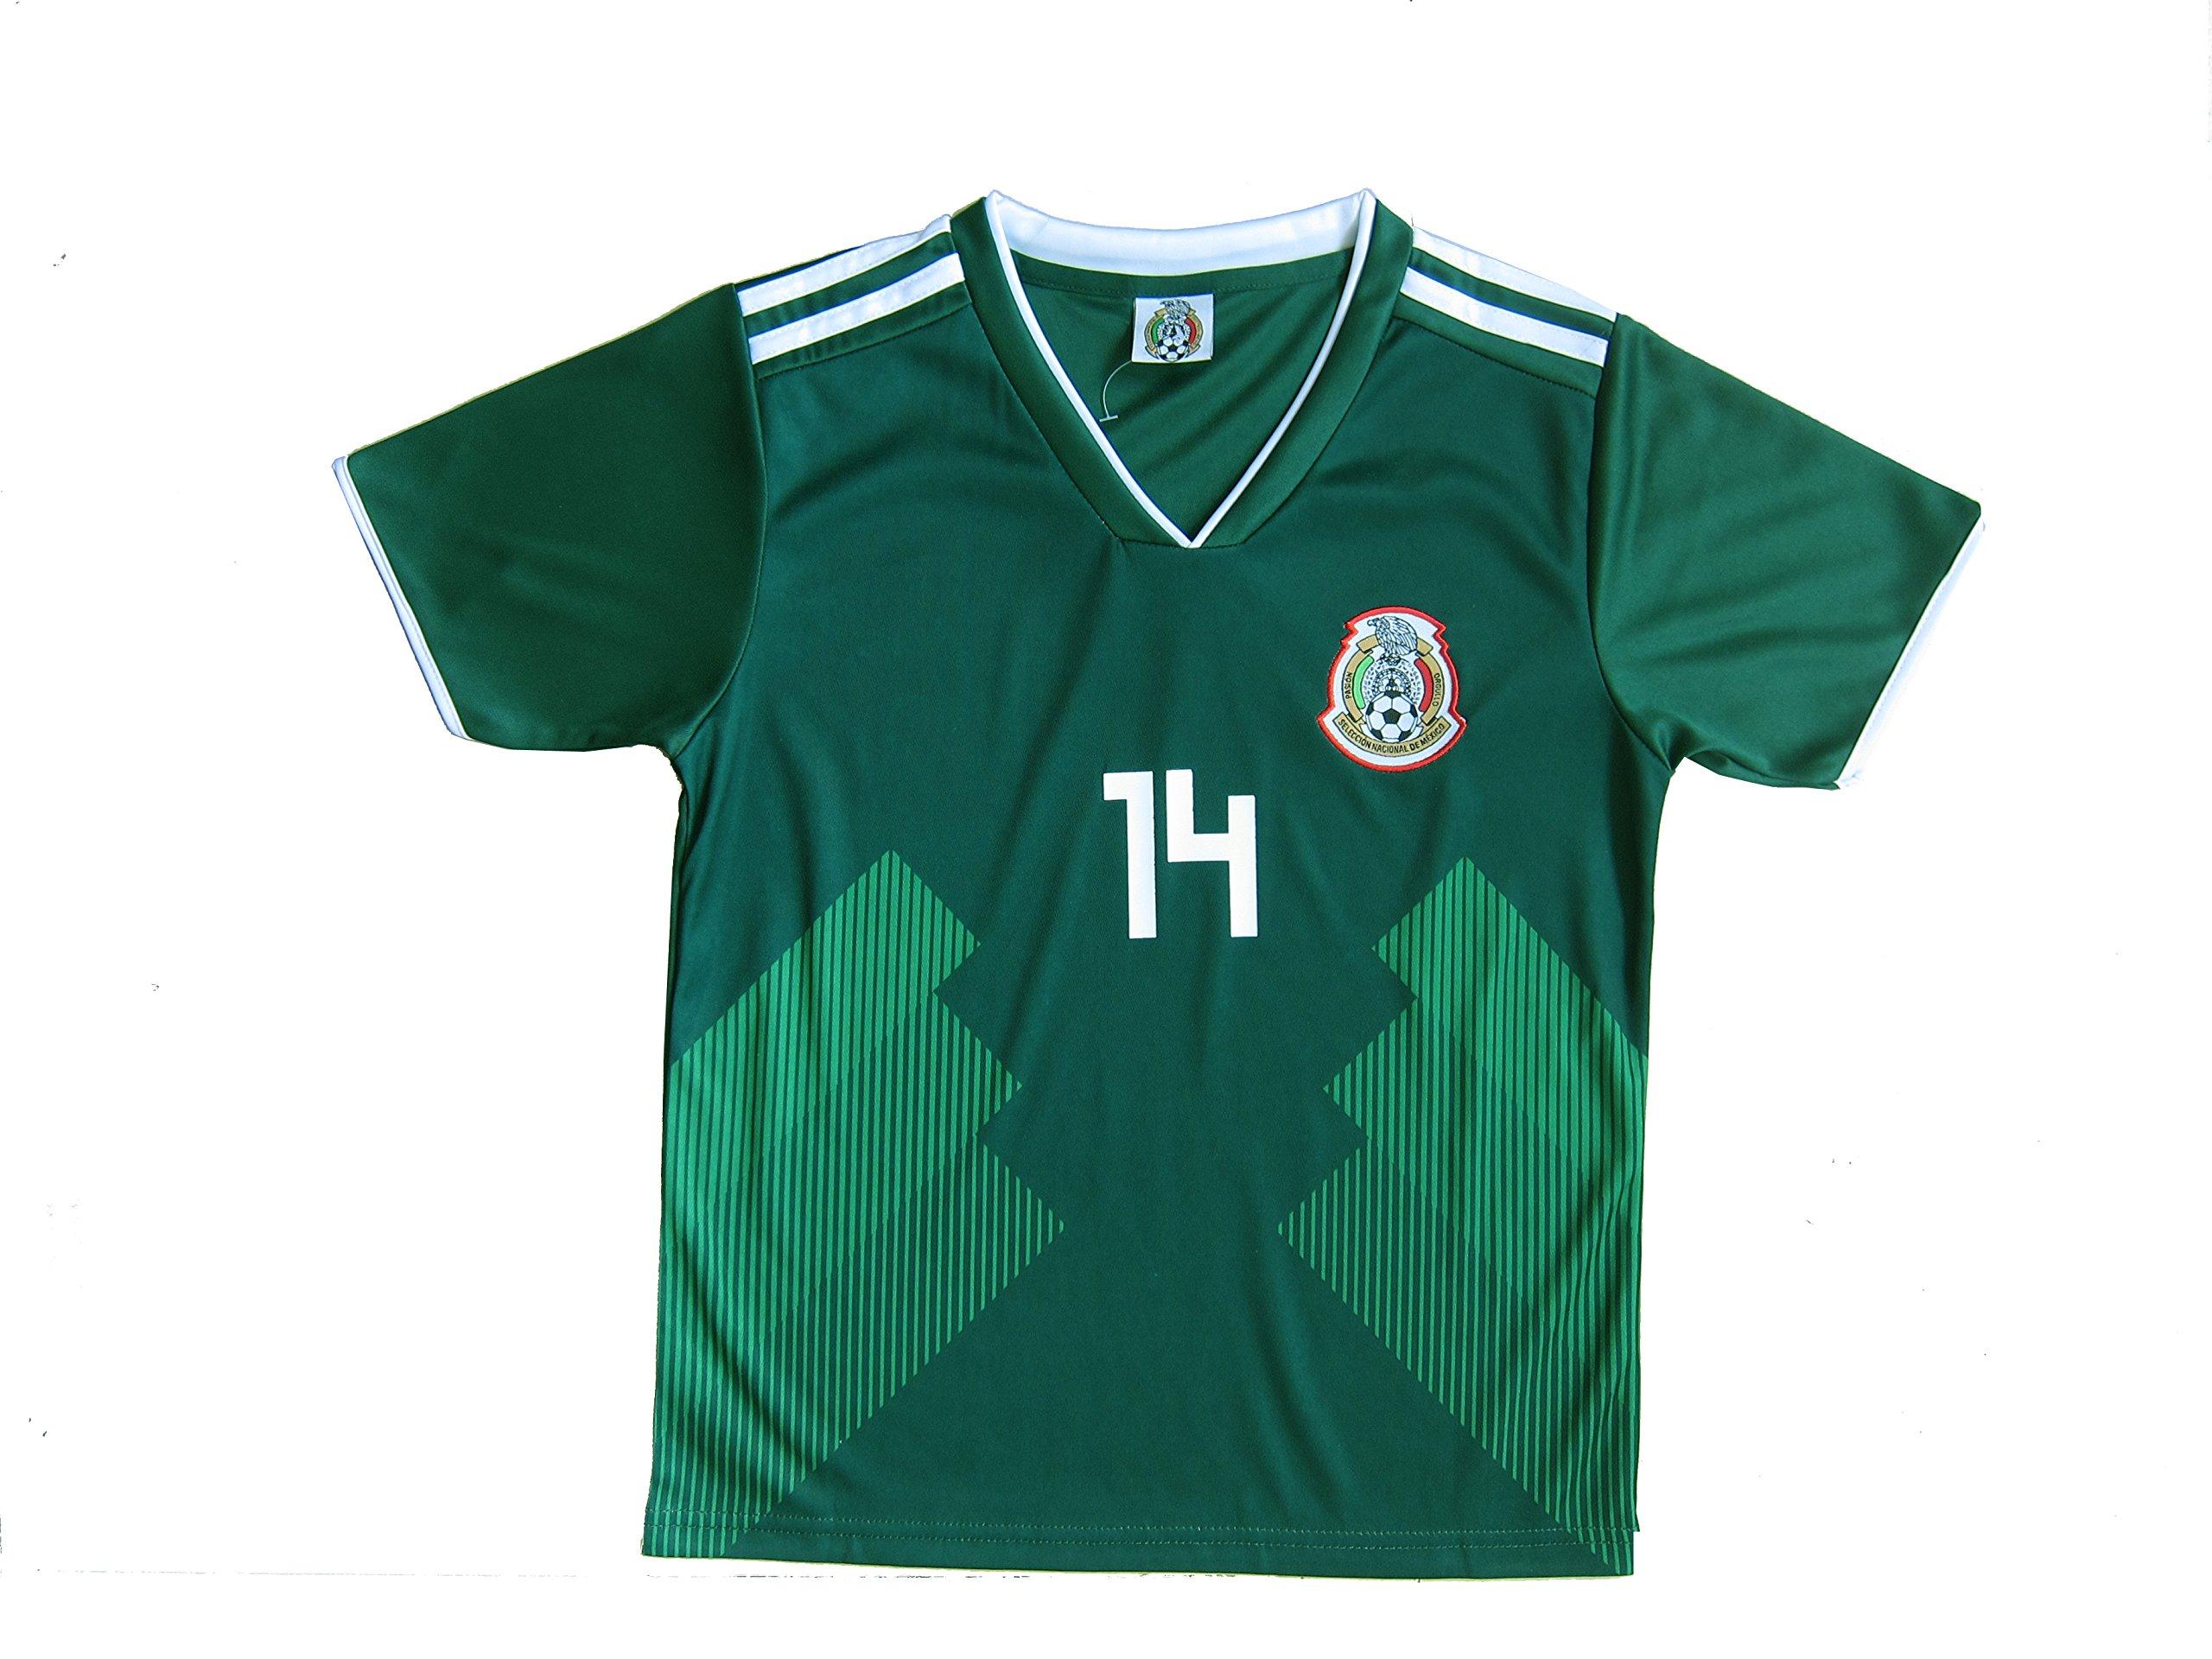 cd15db82e63 KID BOX 2018 Mexico  14 CHICHARITO Kids Home Soccer Jersey   Shorts Socks  Set Youth Sizes   Soccer Equipment   Sports   Outdoors - tibs